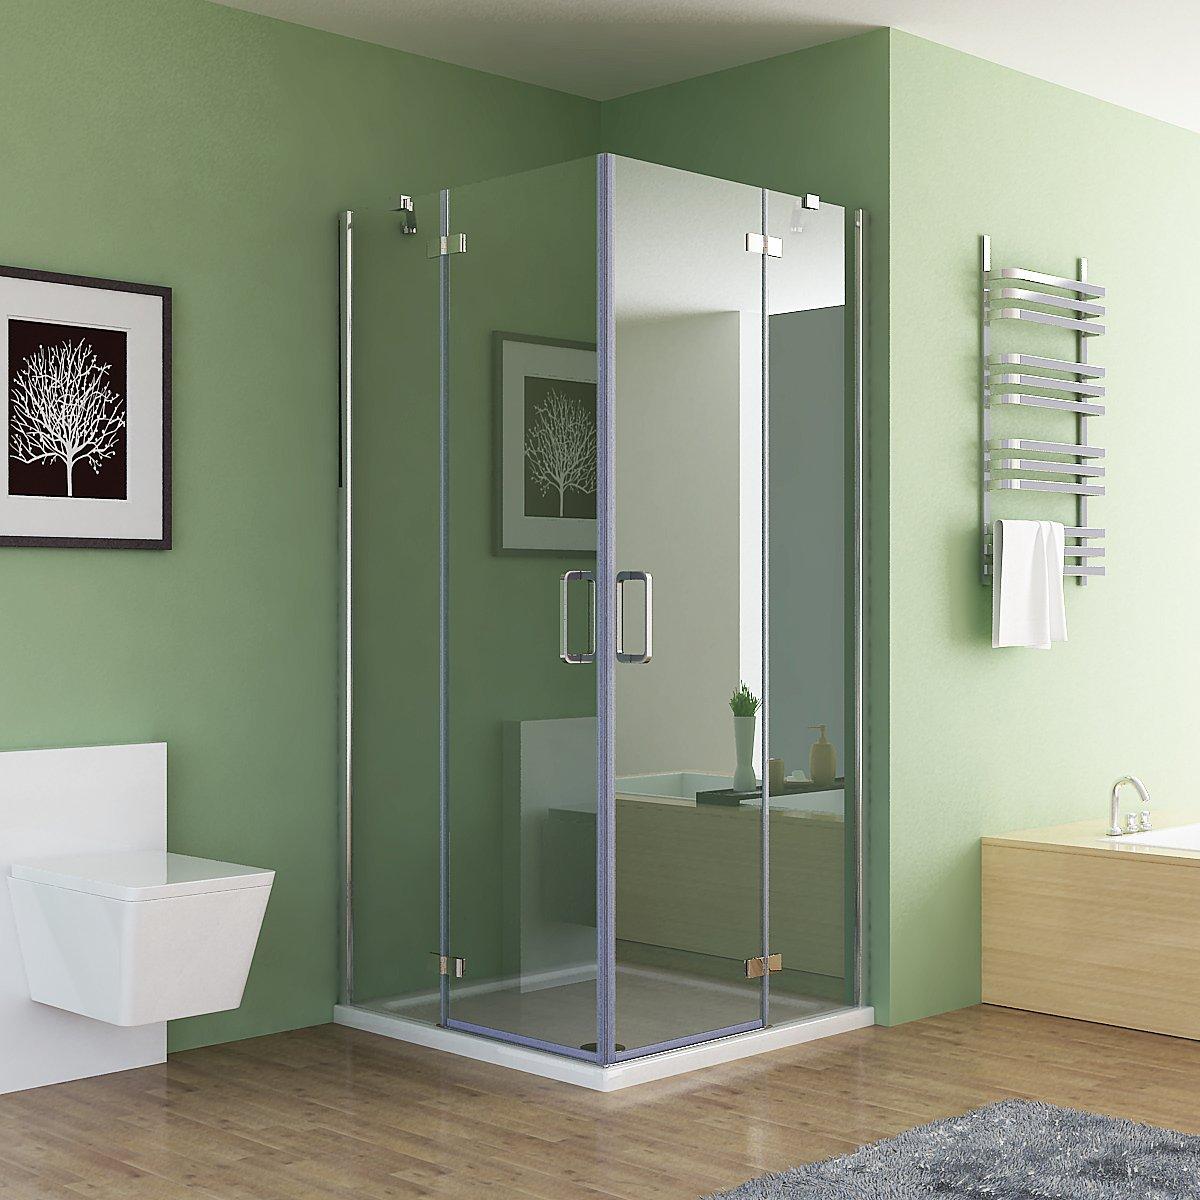 duschkabine mit duschwanne 80 x 80 smartpersoneelsdossier. Black Bedroom Furniture Sets. Home Design Ideas